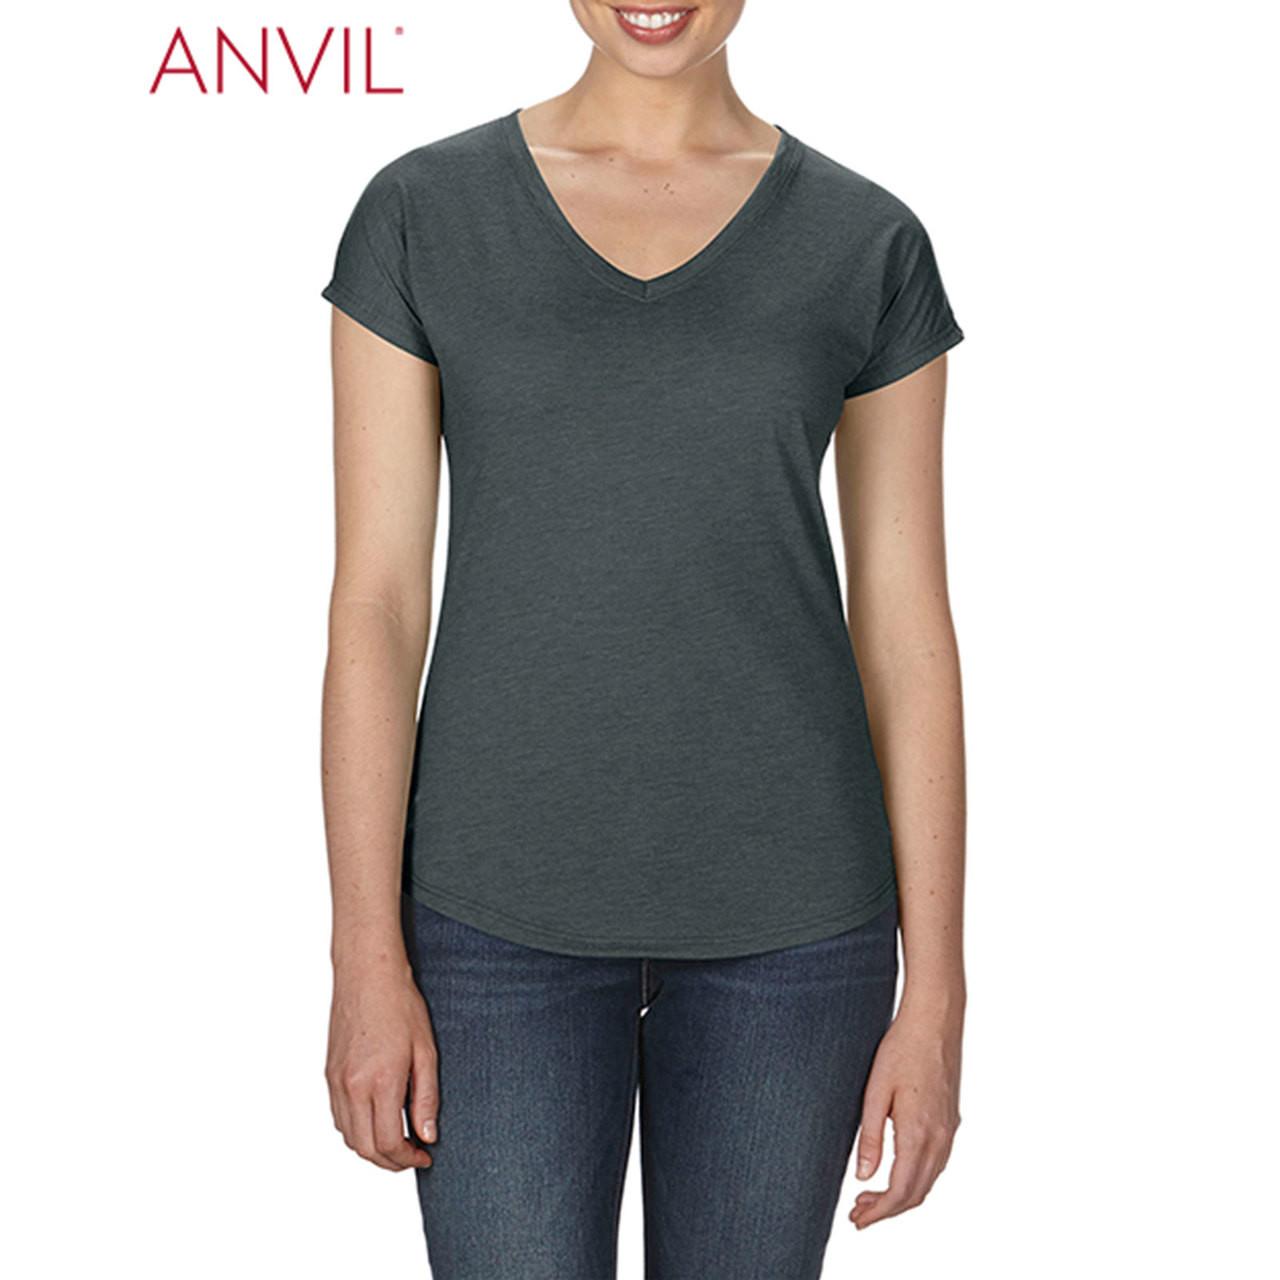 ANVIL LADIES T-SHIRT PLAIN BASIC TOP SEMI FITTED HEATHER COLOURS WOMEN/'S XS-2XL